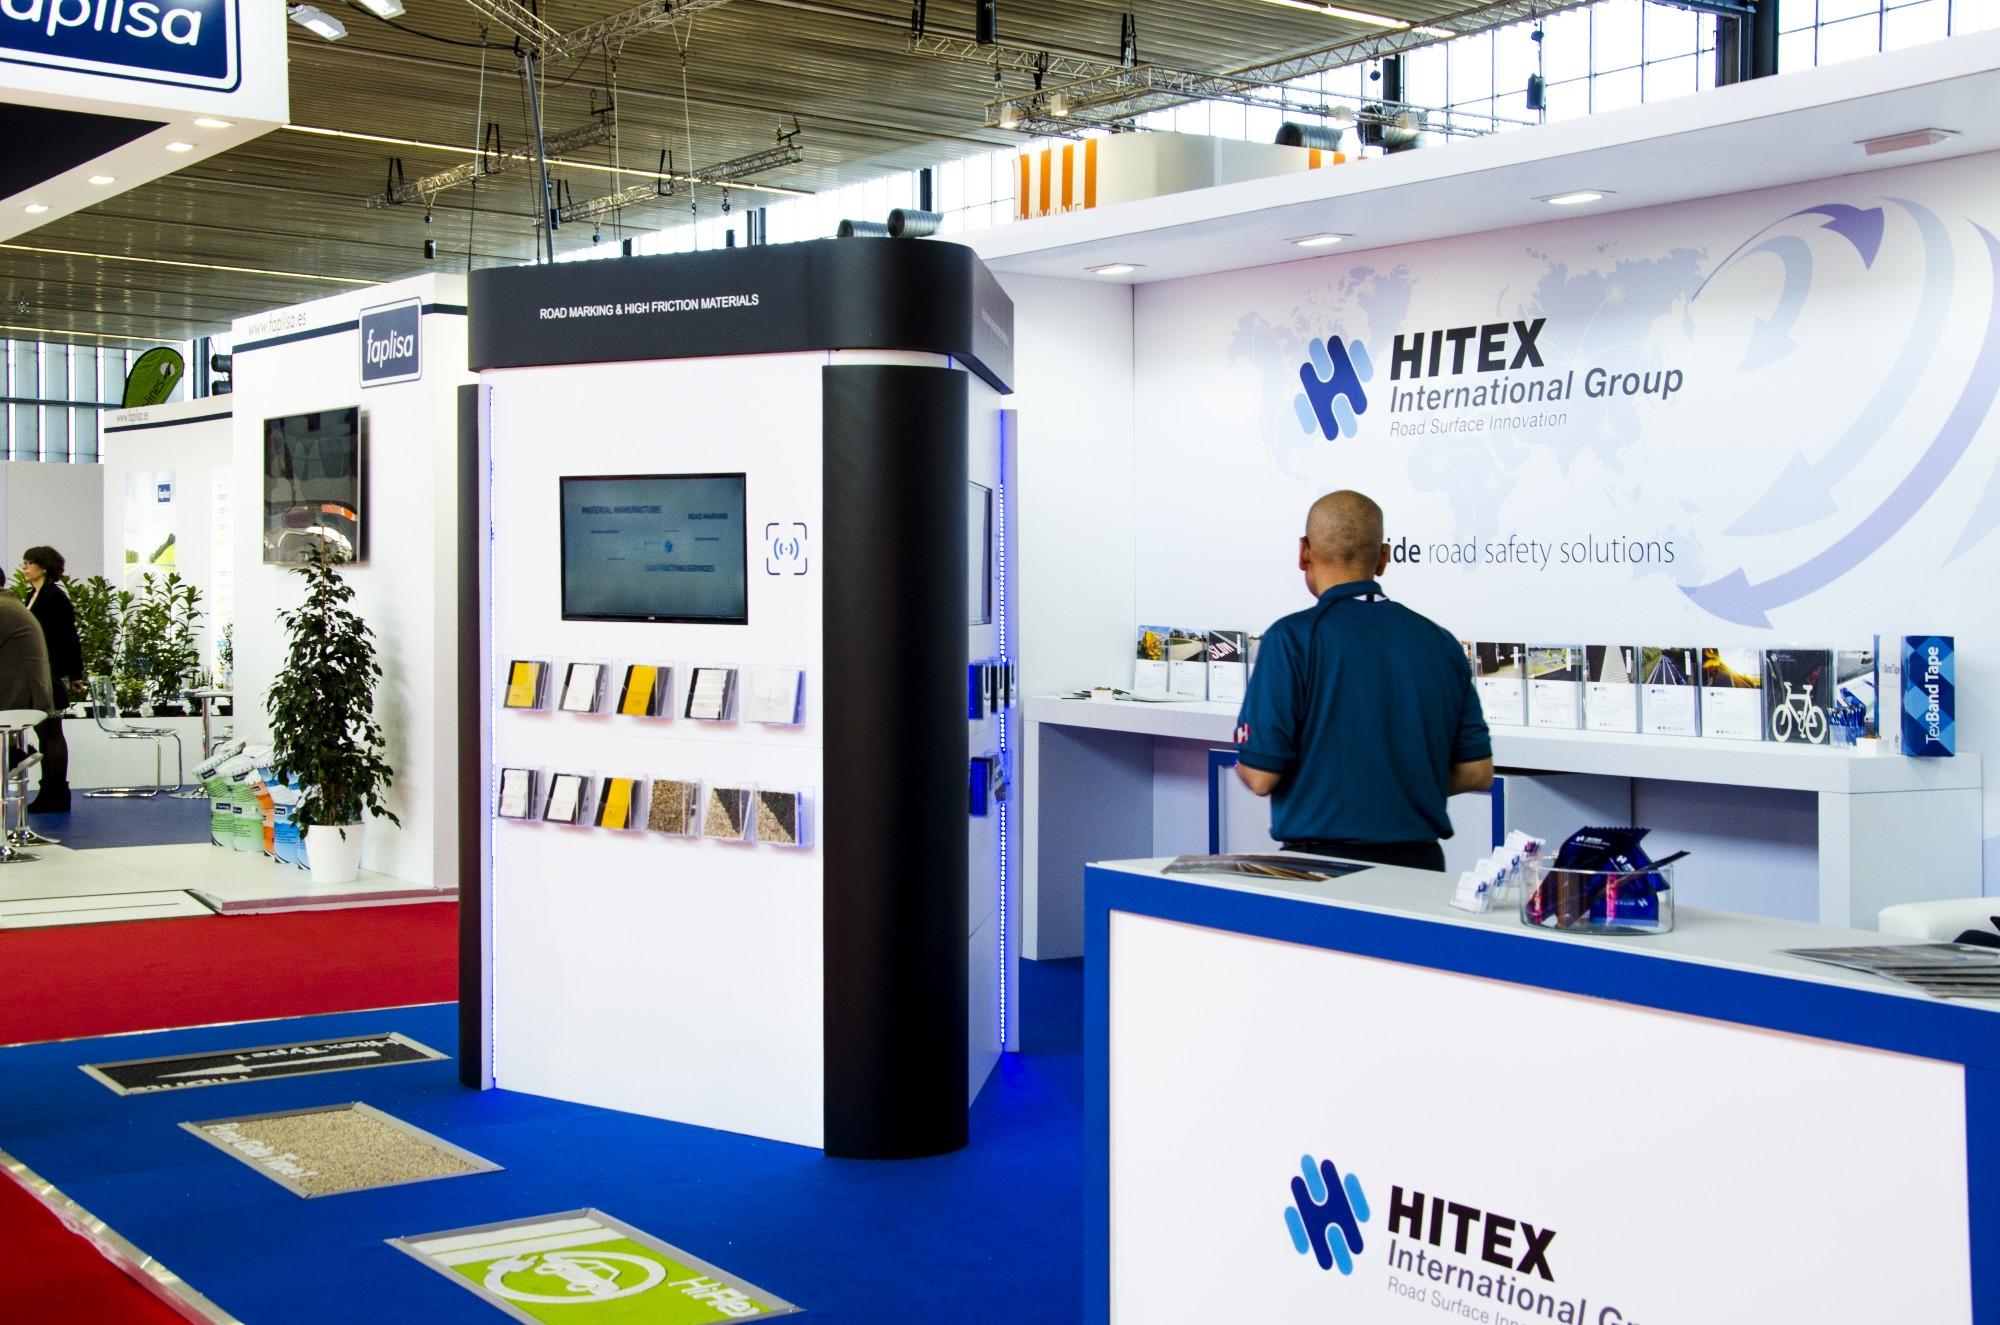 Hitex at Intertraffic 2018 26